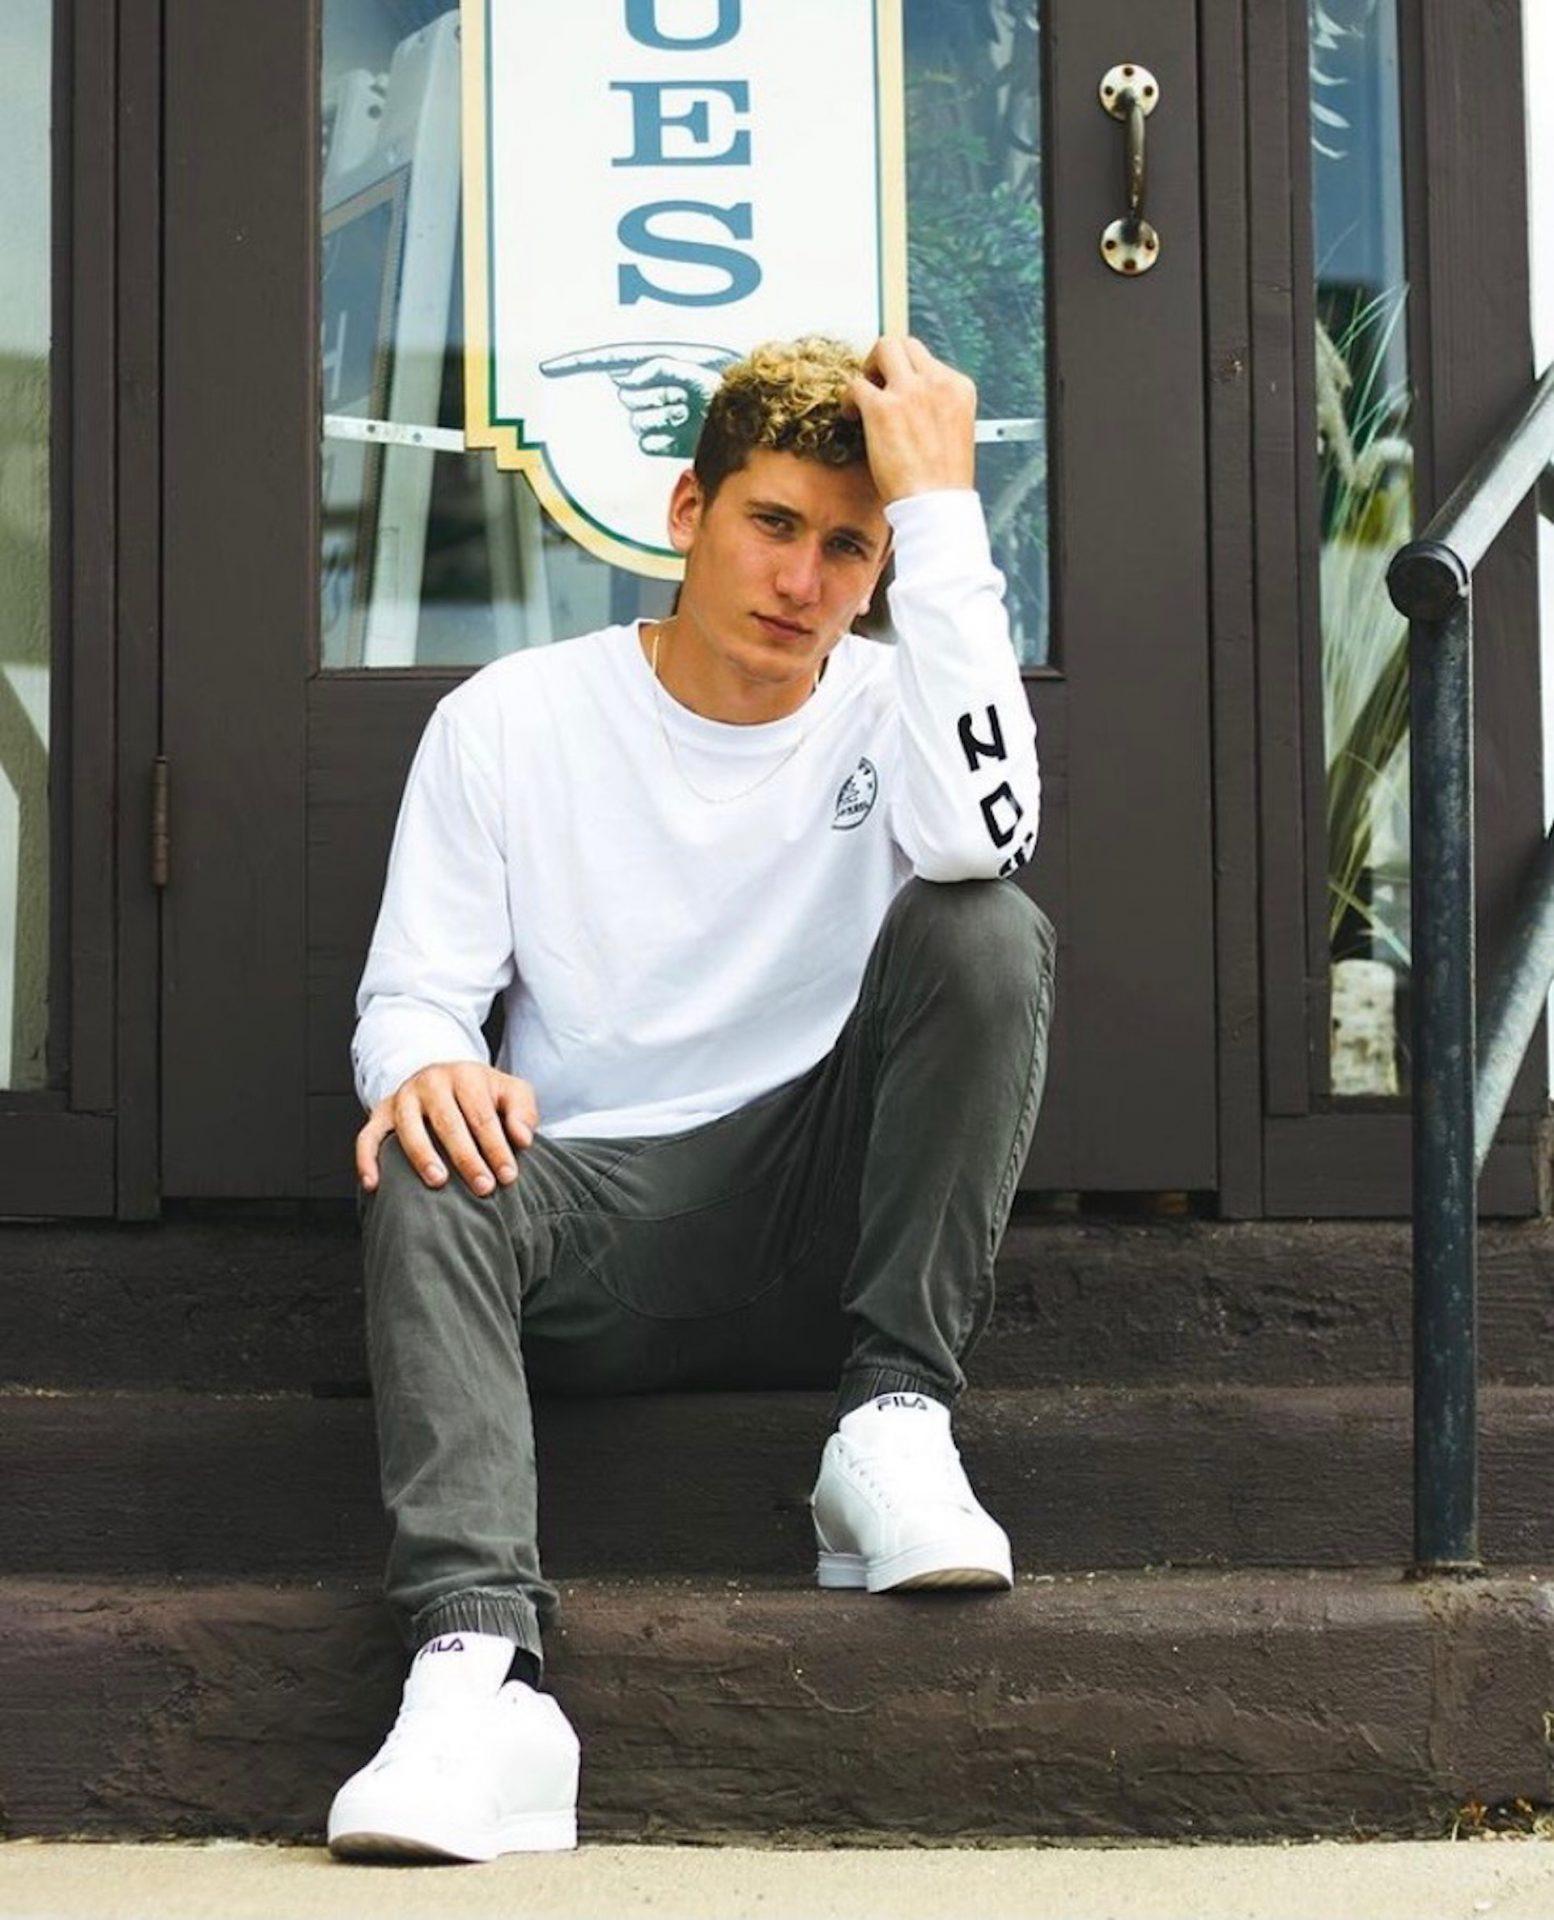 Jan Cervenka sitting on steps in front of a glass door.